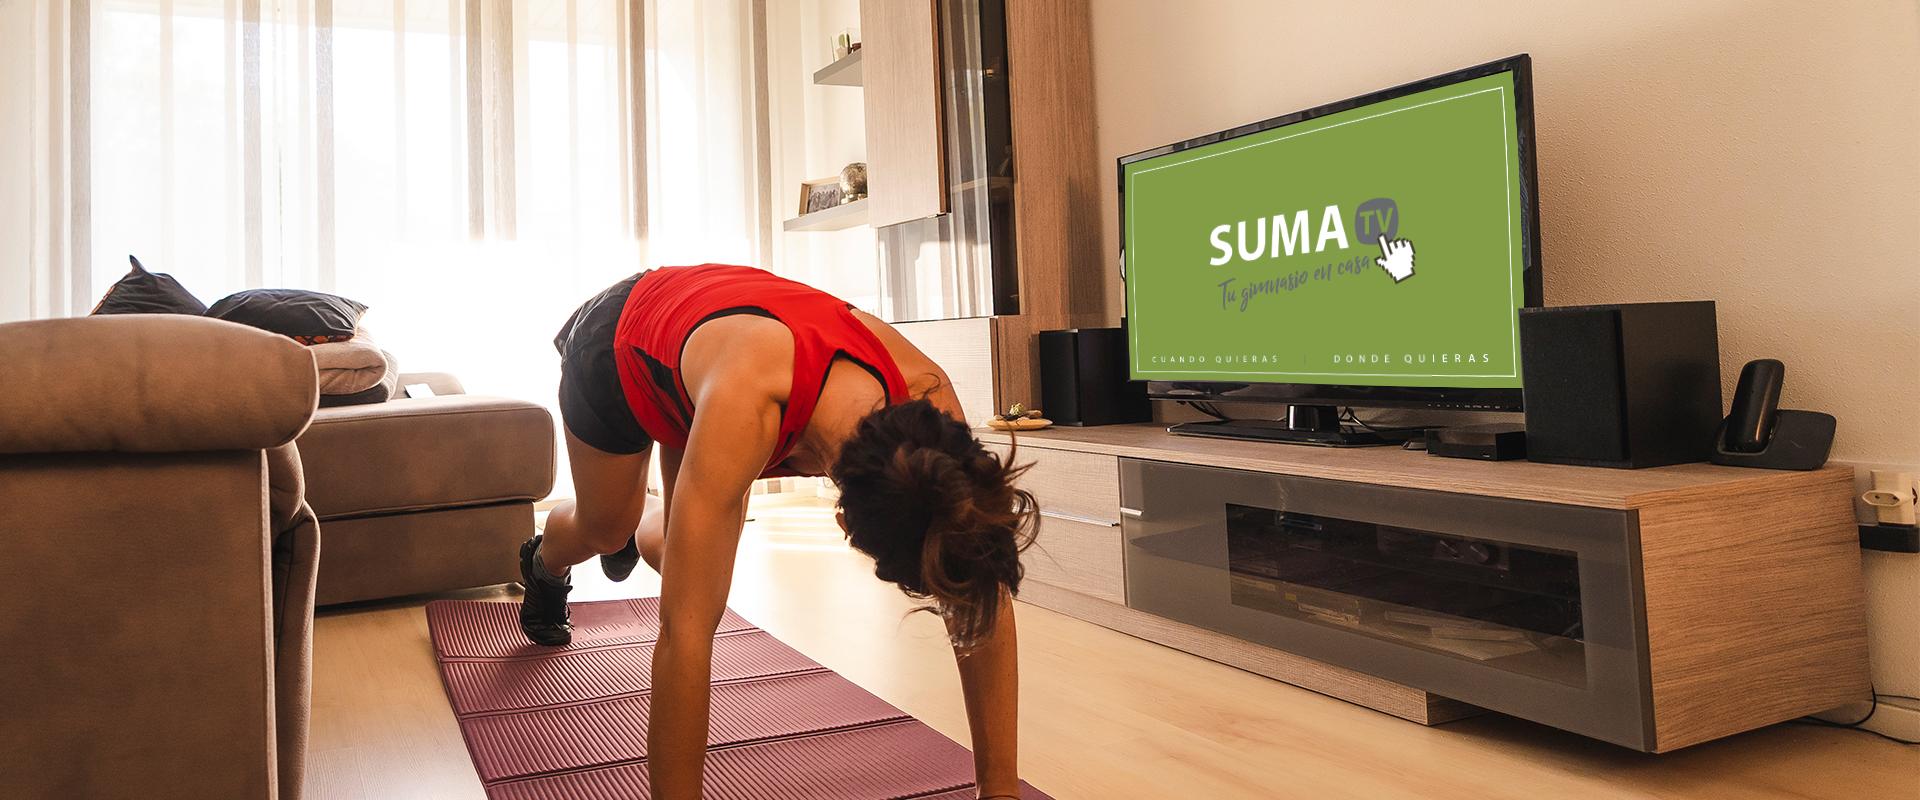 DESCUBRE SUMA TV